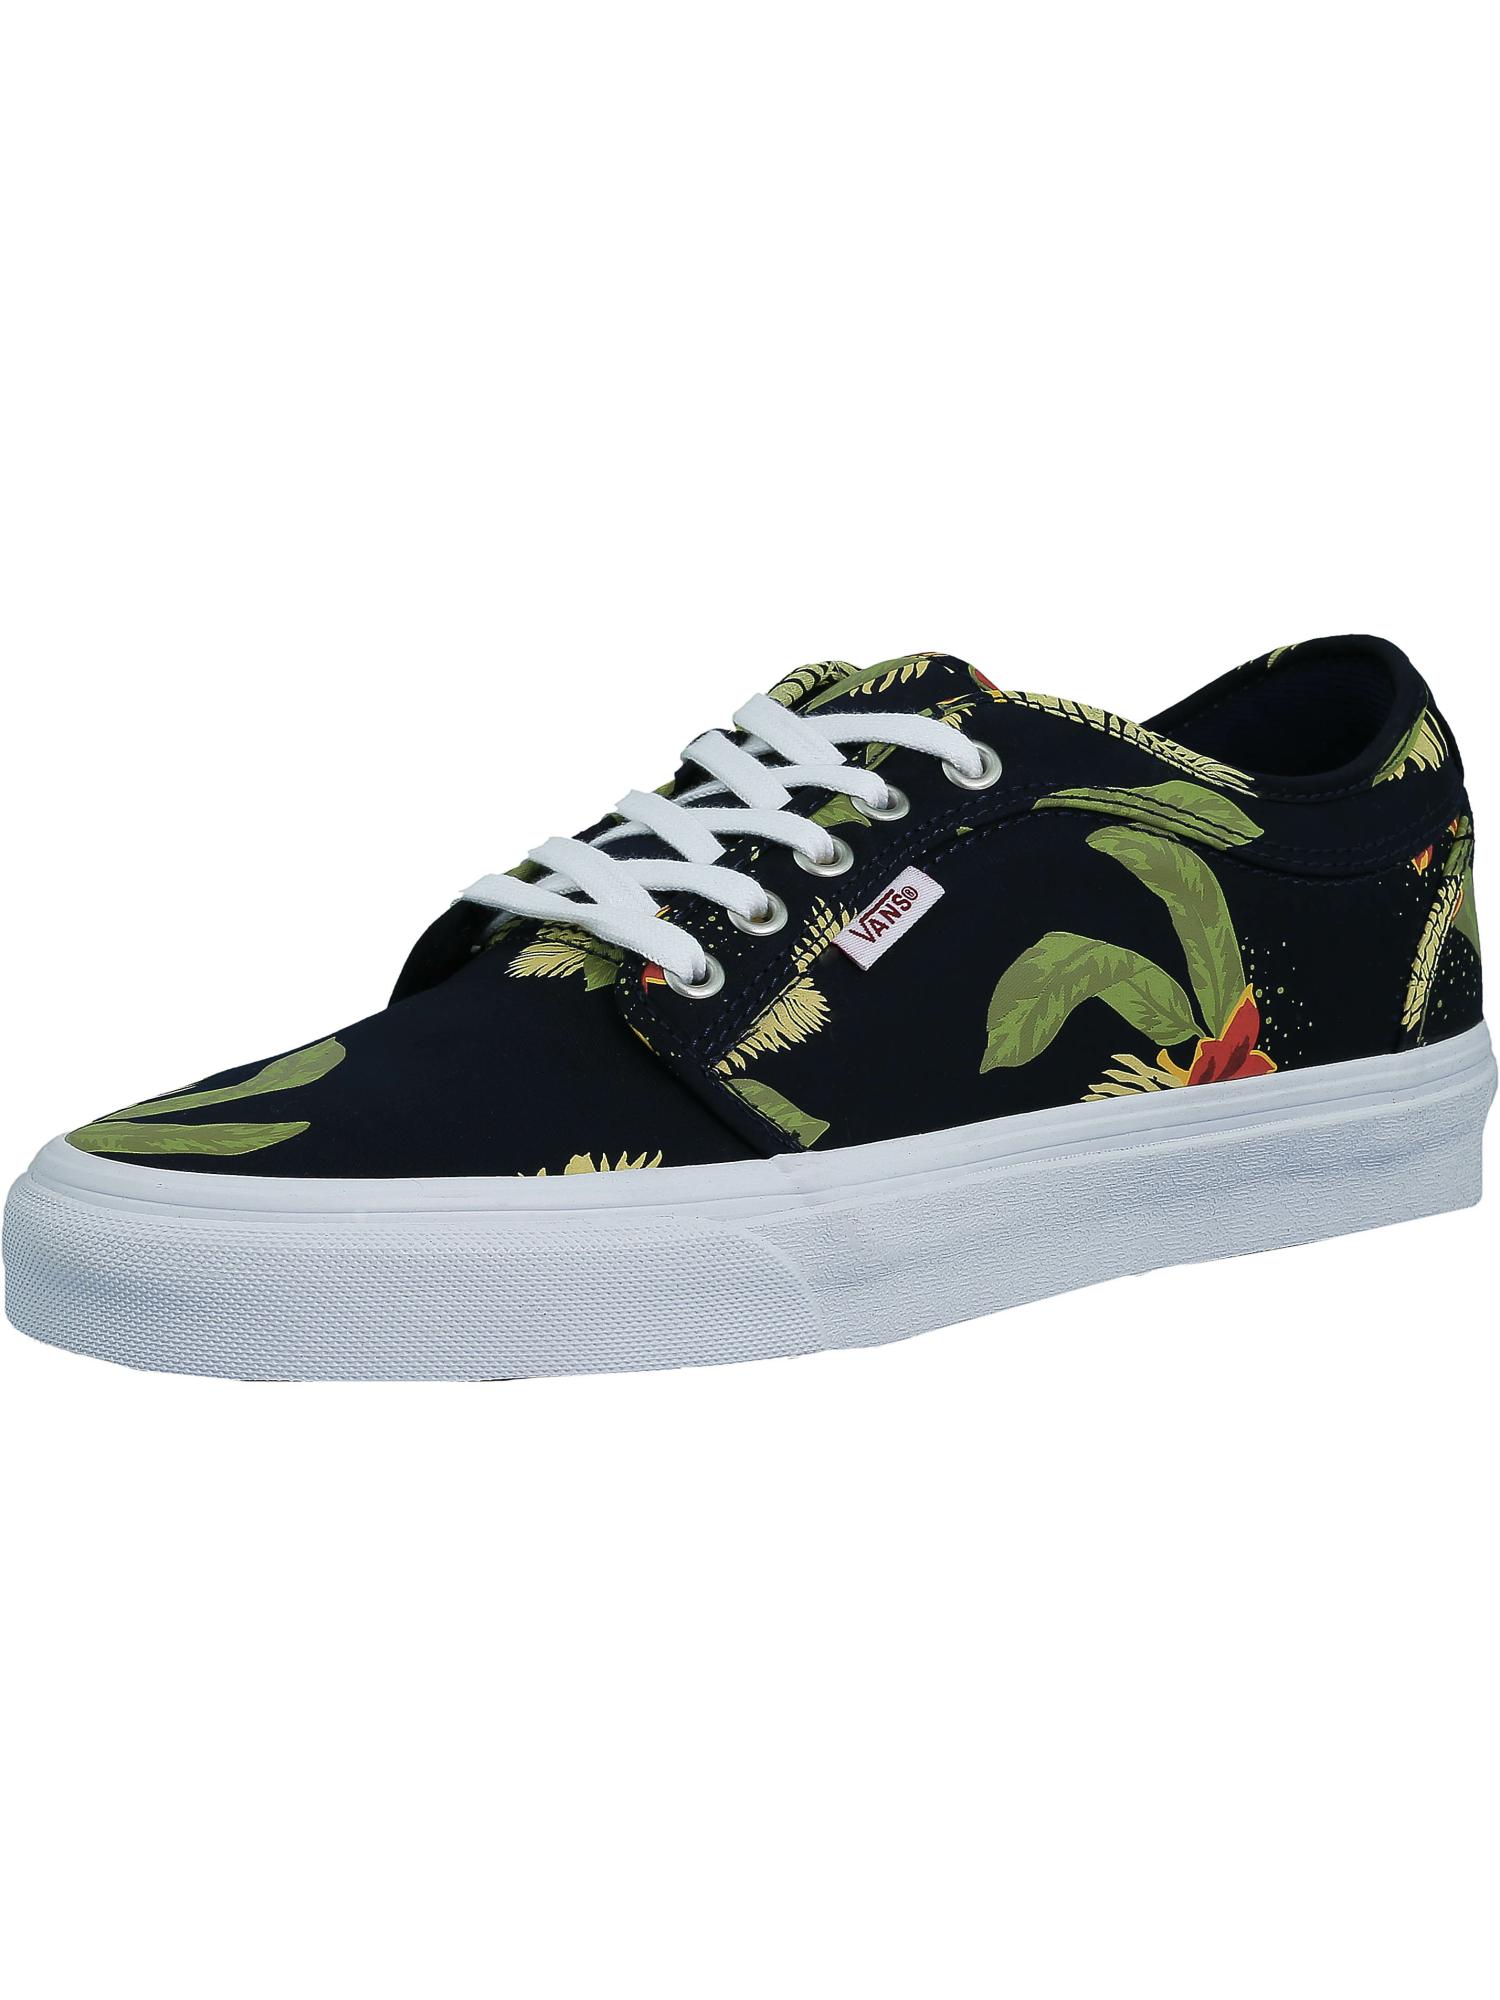 Vans Men's Chukka Low Aloha Ankle-High Fabric Skateboarding Shoe